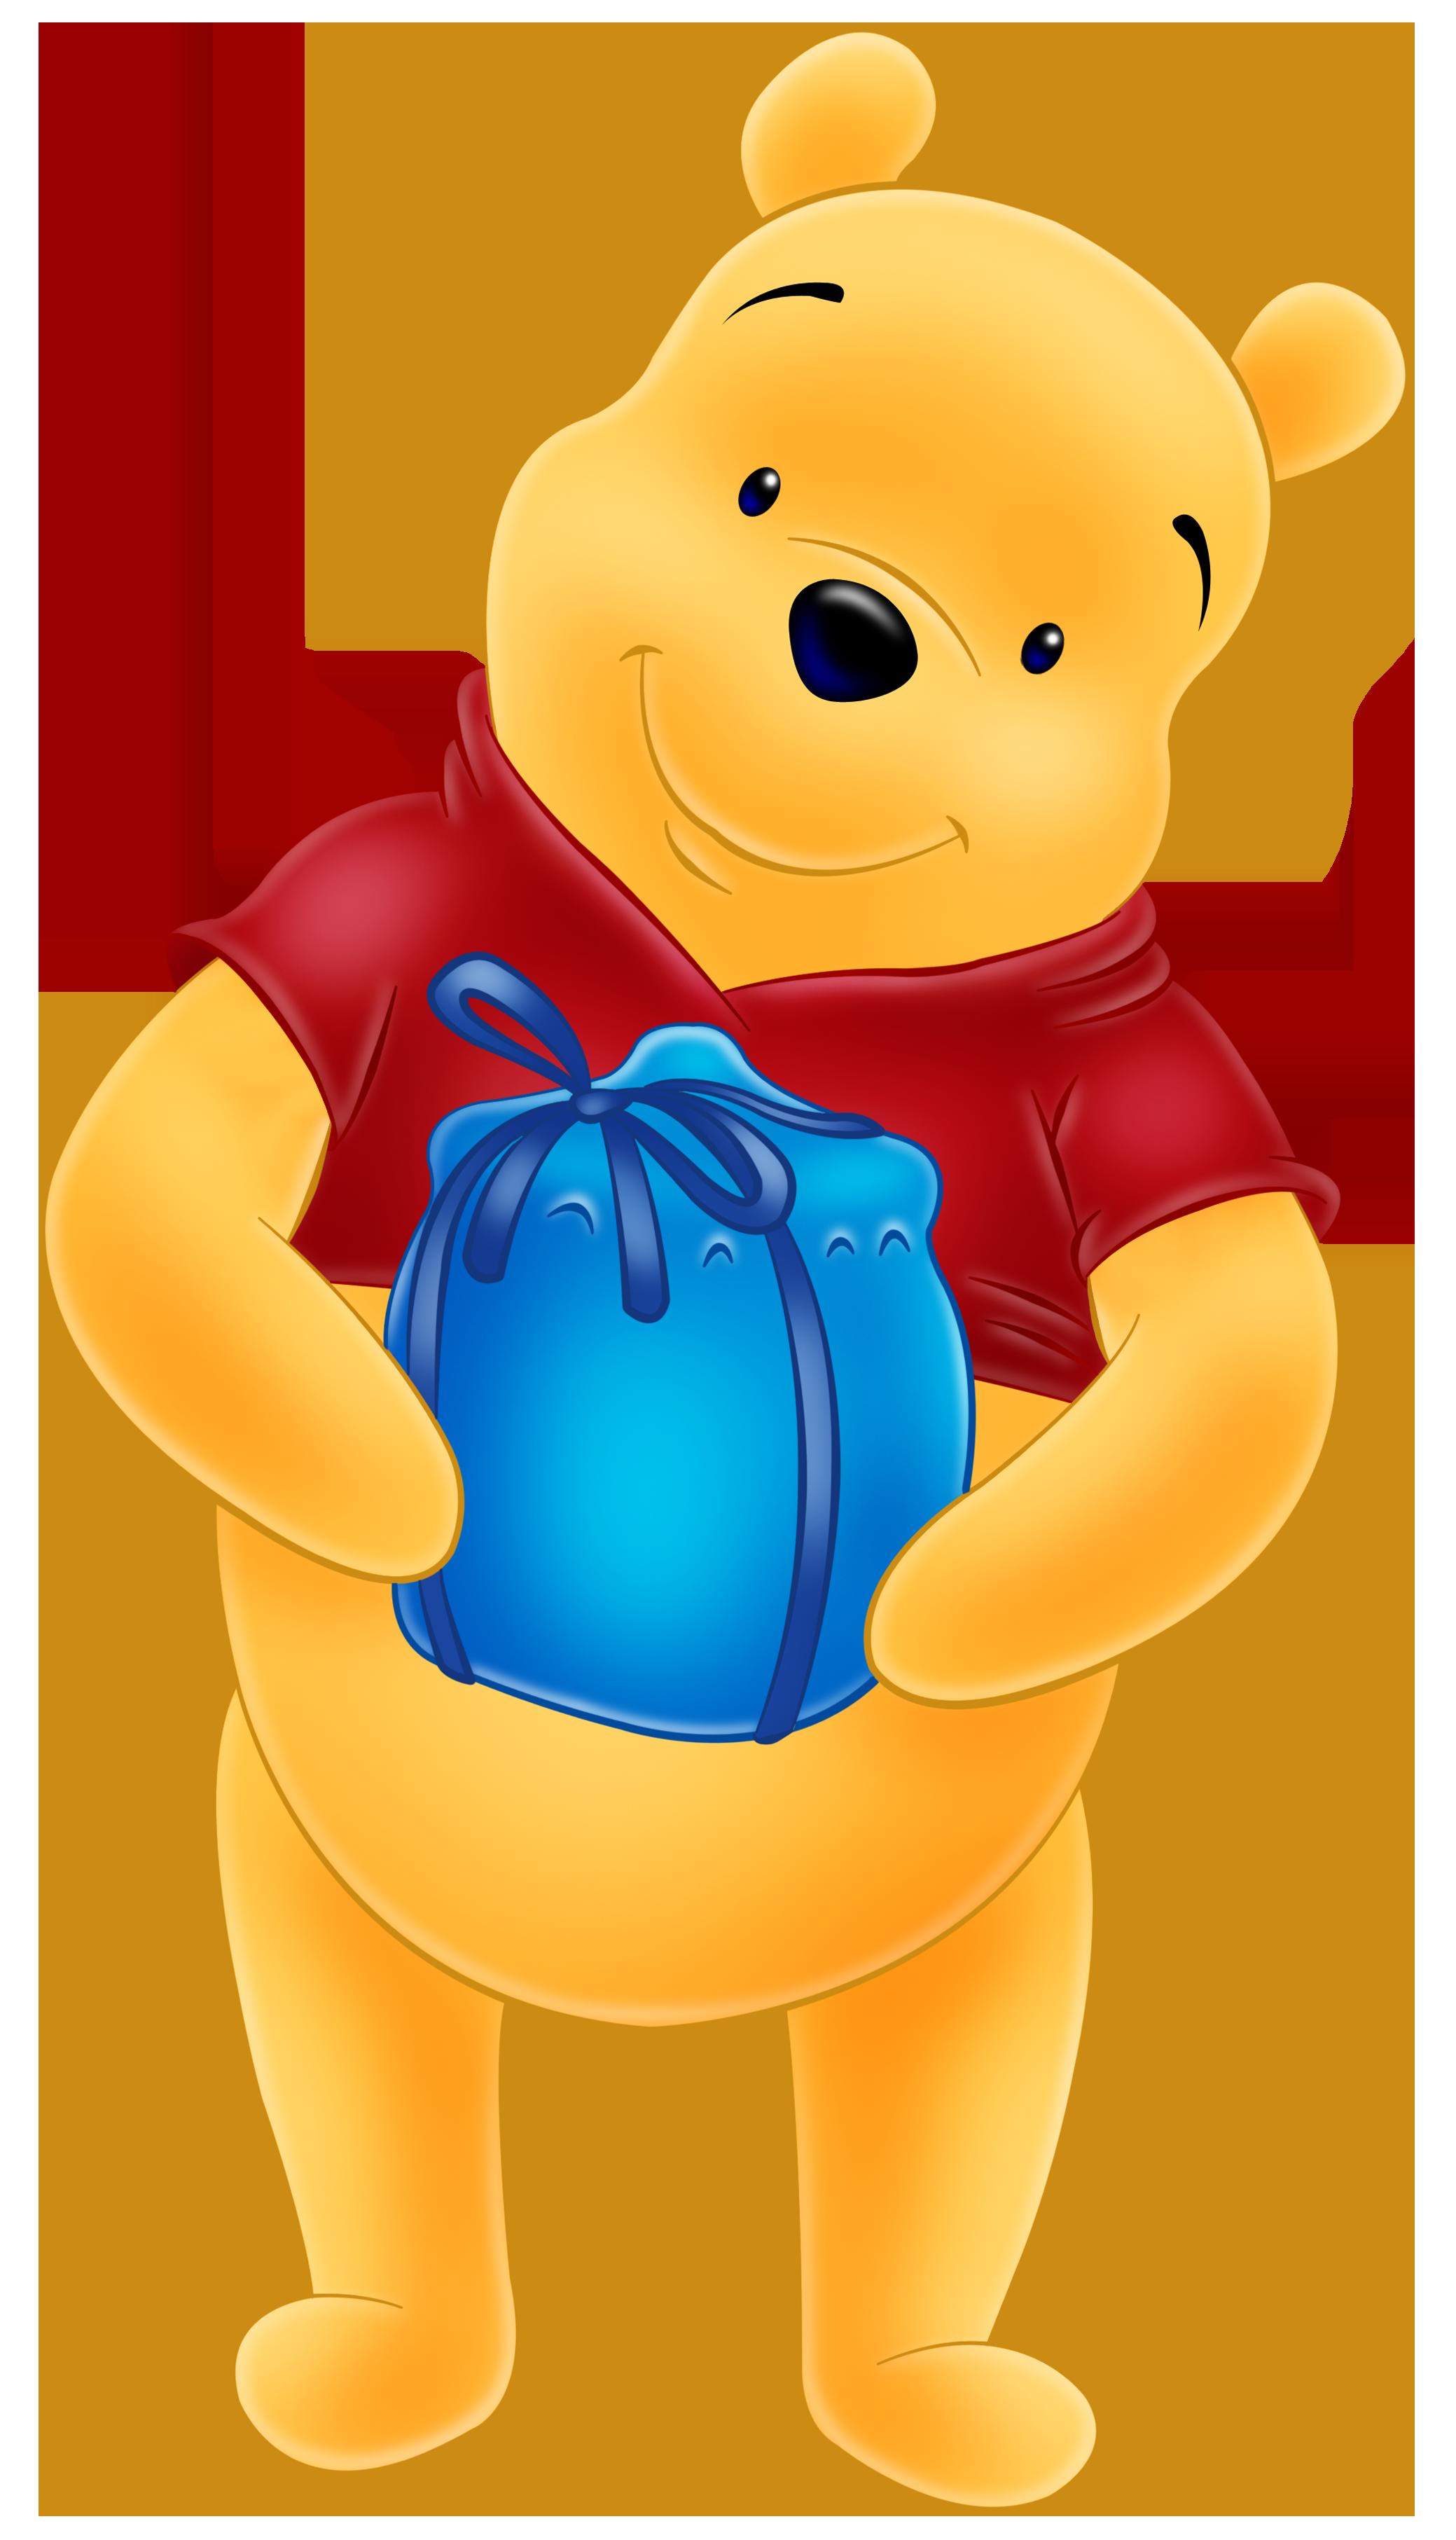 2079x3626 Winnie The Pooh Free Png Clip Art Imageu200b Gallery Yopriceville